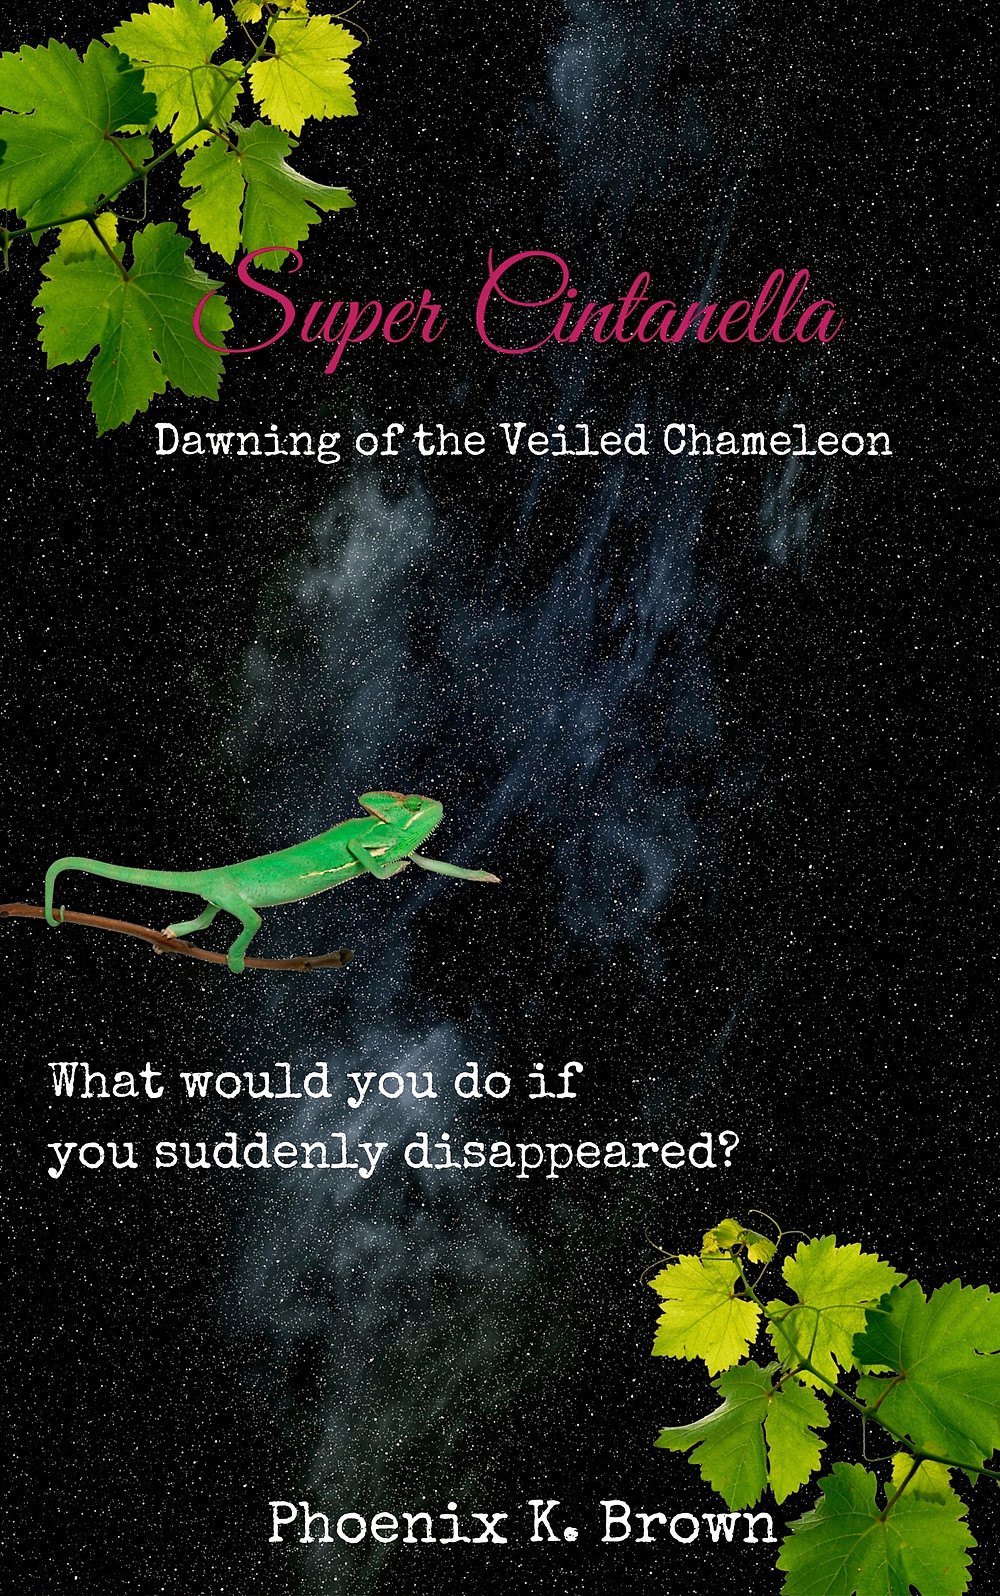 Super  Cintanella(3).jpg